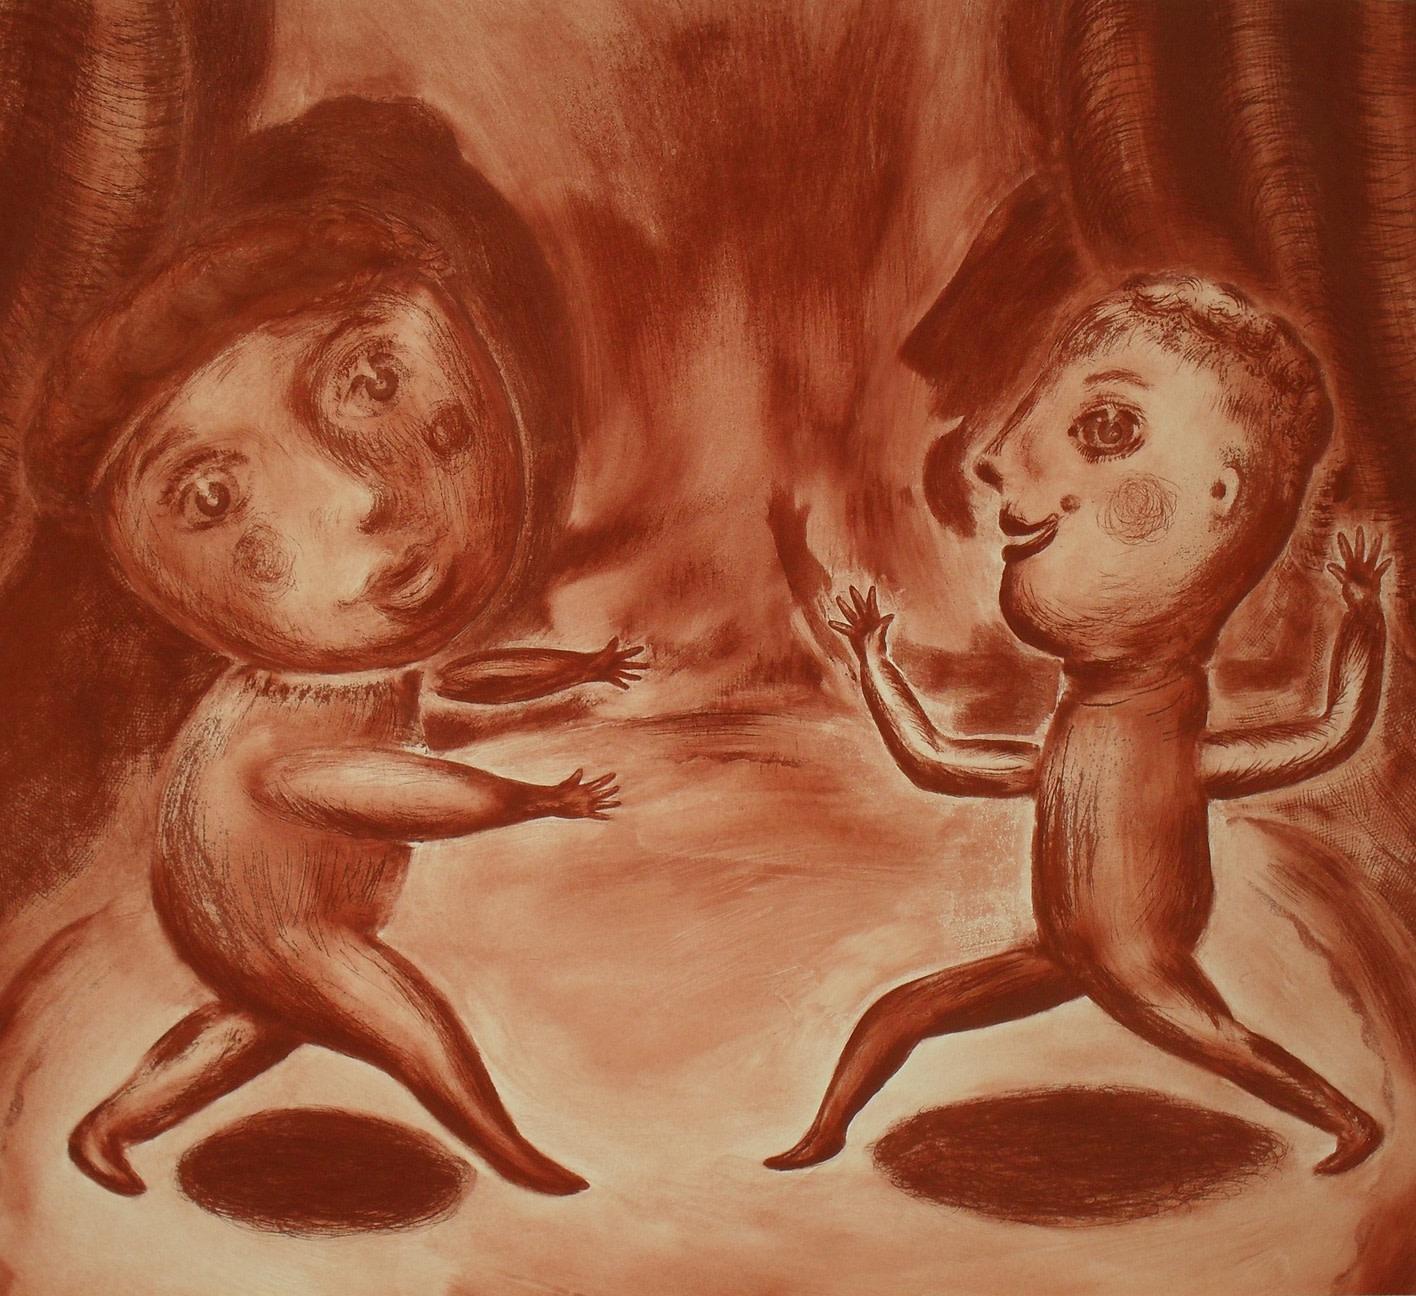 <span class=&#34;link fancybox-details-link&#34;><a href=&#34;/exhibitions/25/works/image_standalone530/&#34;>View Detail Page</a></span><p>Richard Dalkins</p><p><em>The Dancers</em></p>